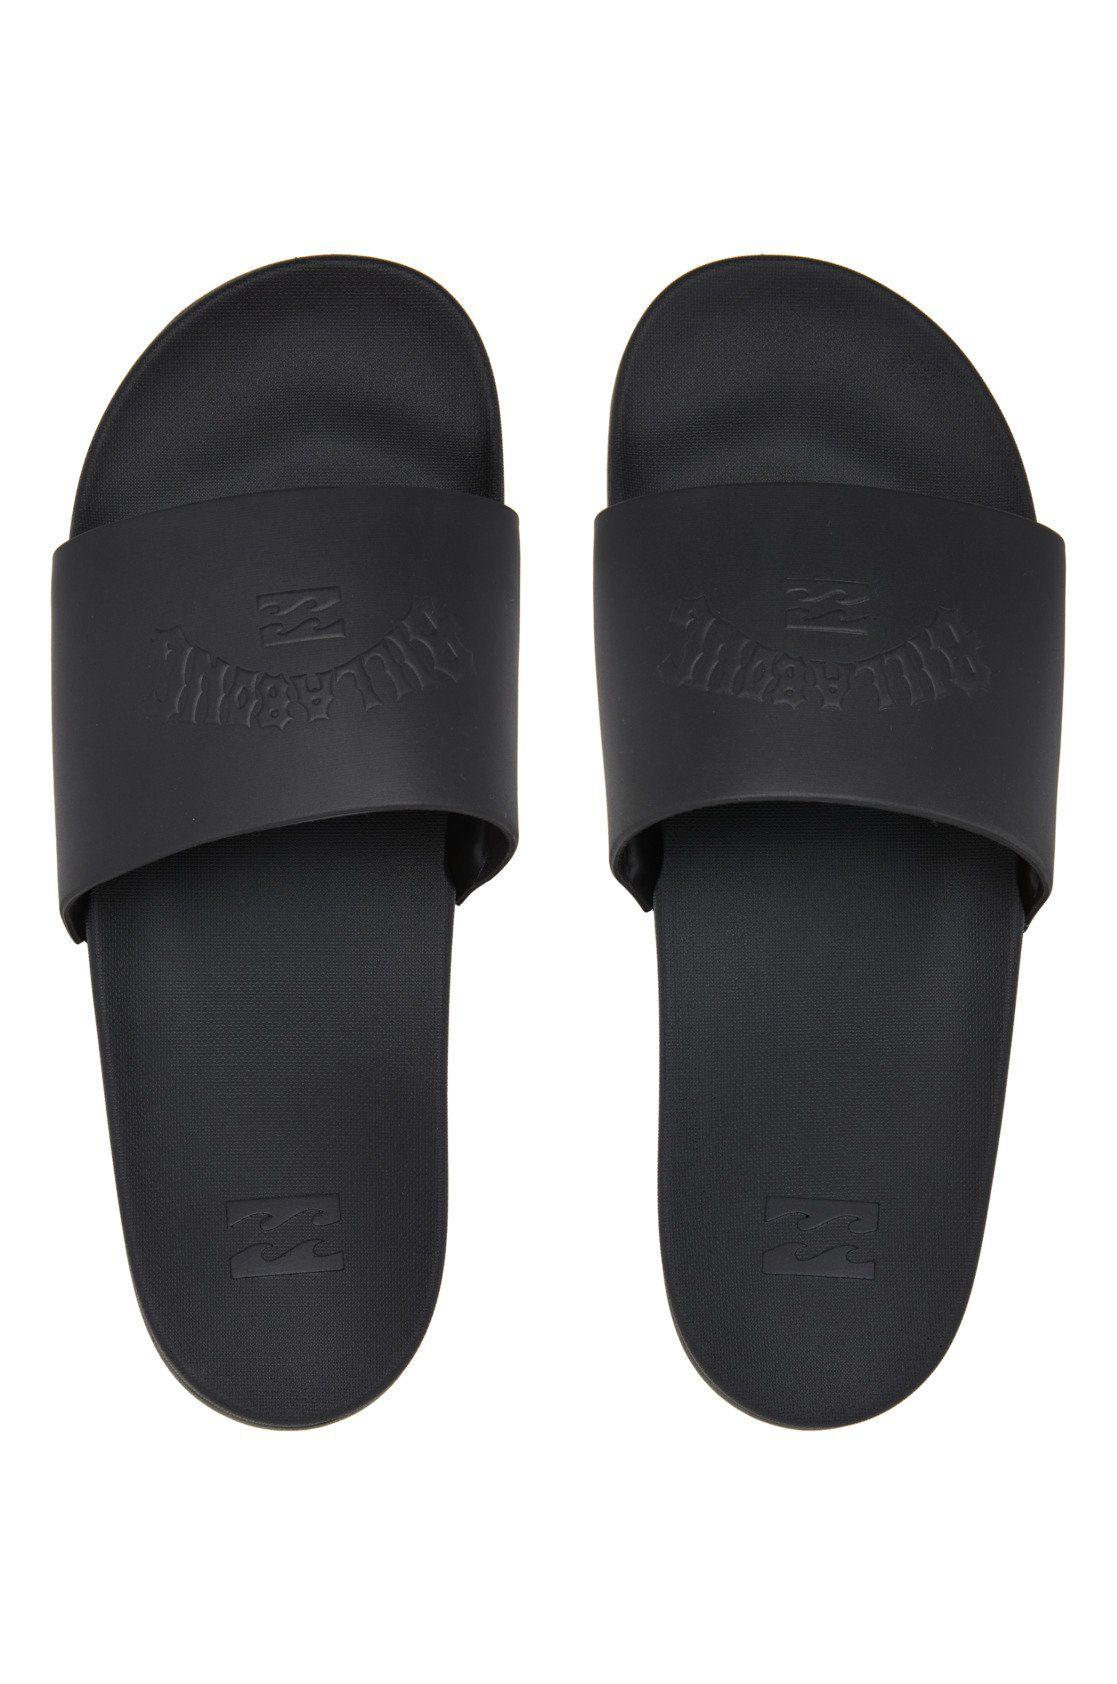 Billabong Sandals CUSH SLIDE Black